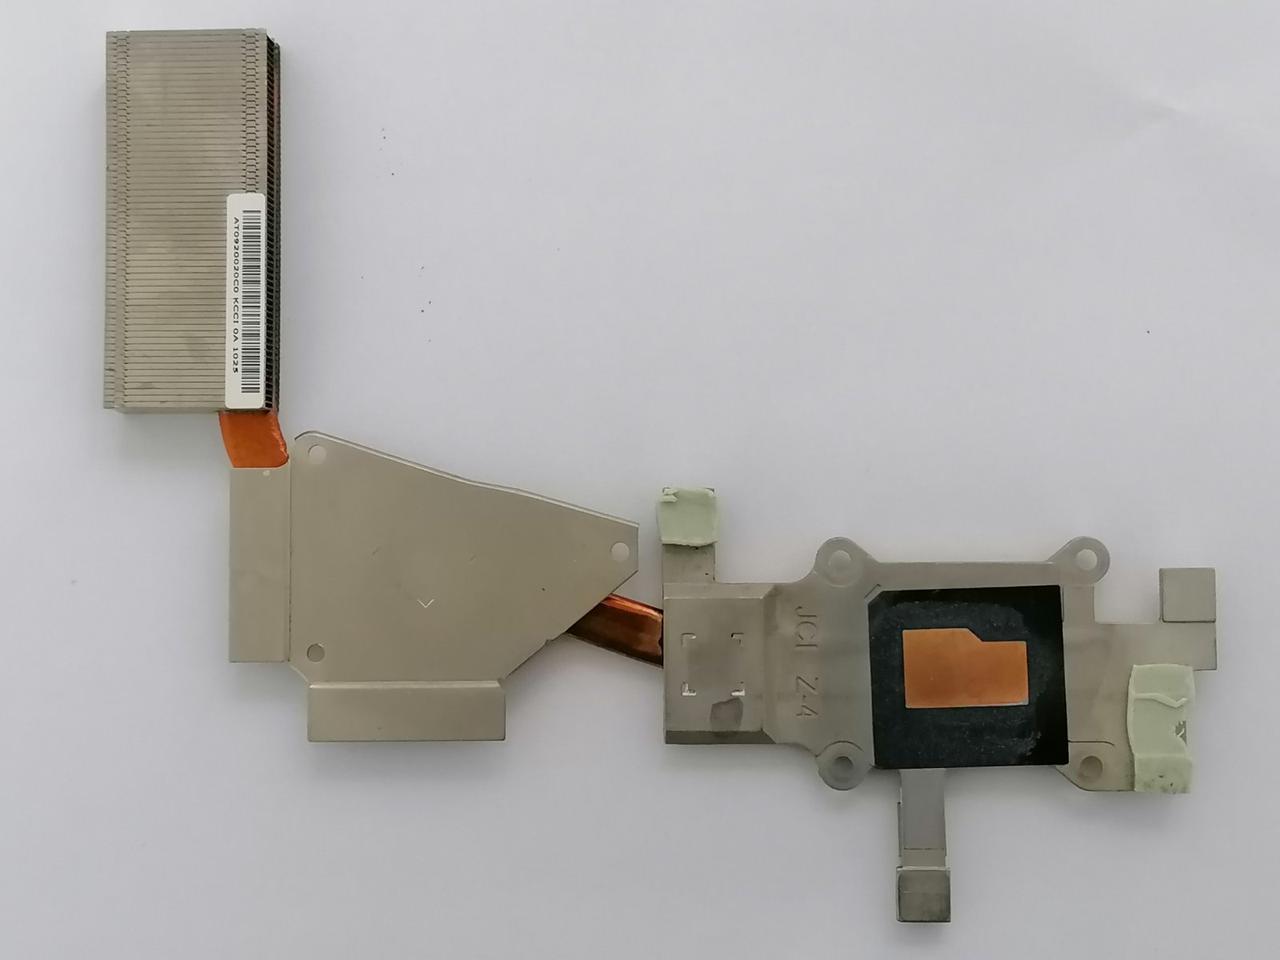 Б/У радиатор ( система охлаждения ) для ноутбука Toshiba Satellite L505 L505 13T - AT0920020C0